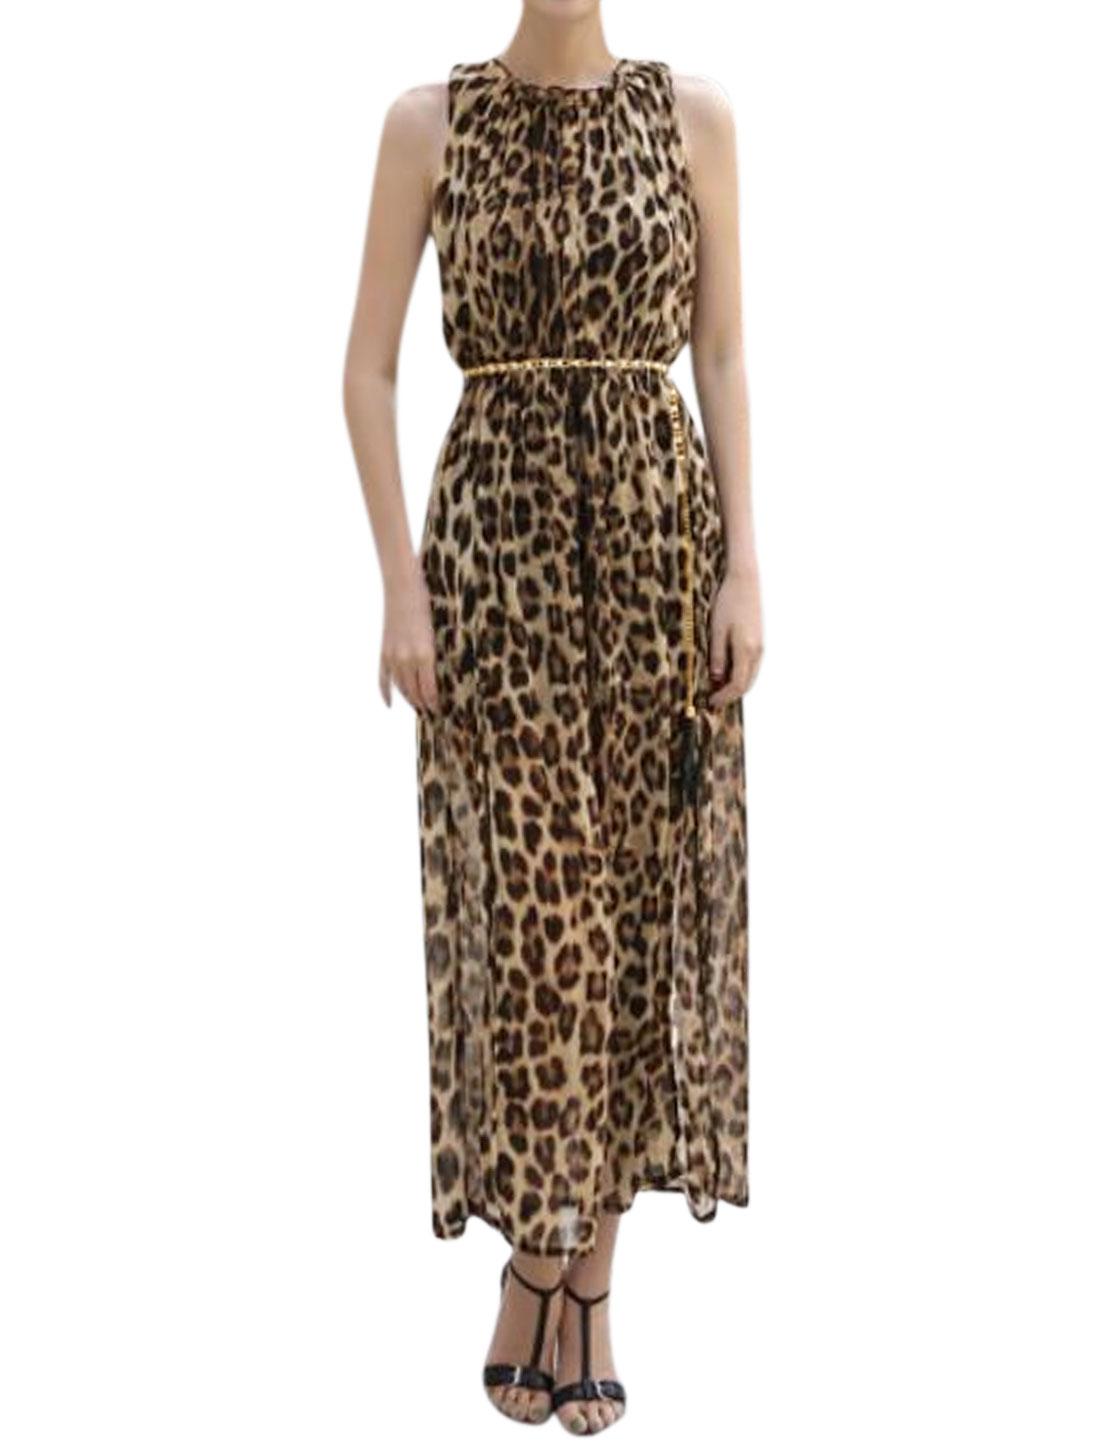 Women Leopard Prints Elastic Waist Chiffon Dress w Belt Brown S